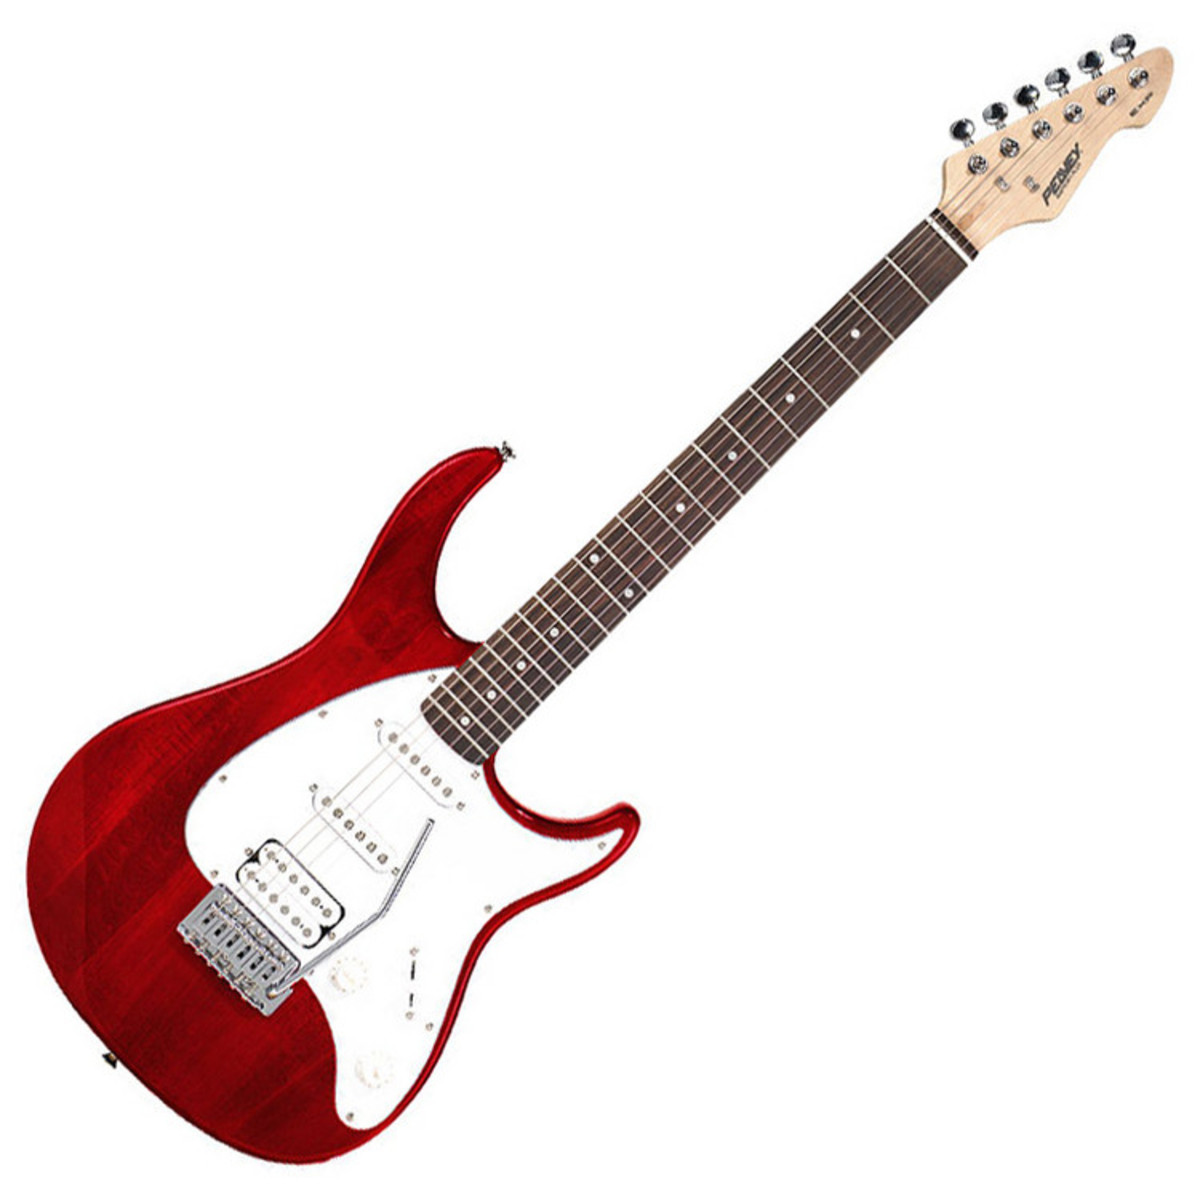 peavey raptor plus exp guitare lectrique rouge trans. Black Bedroom Furniture Sets. Home Design Ideas